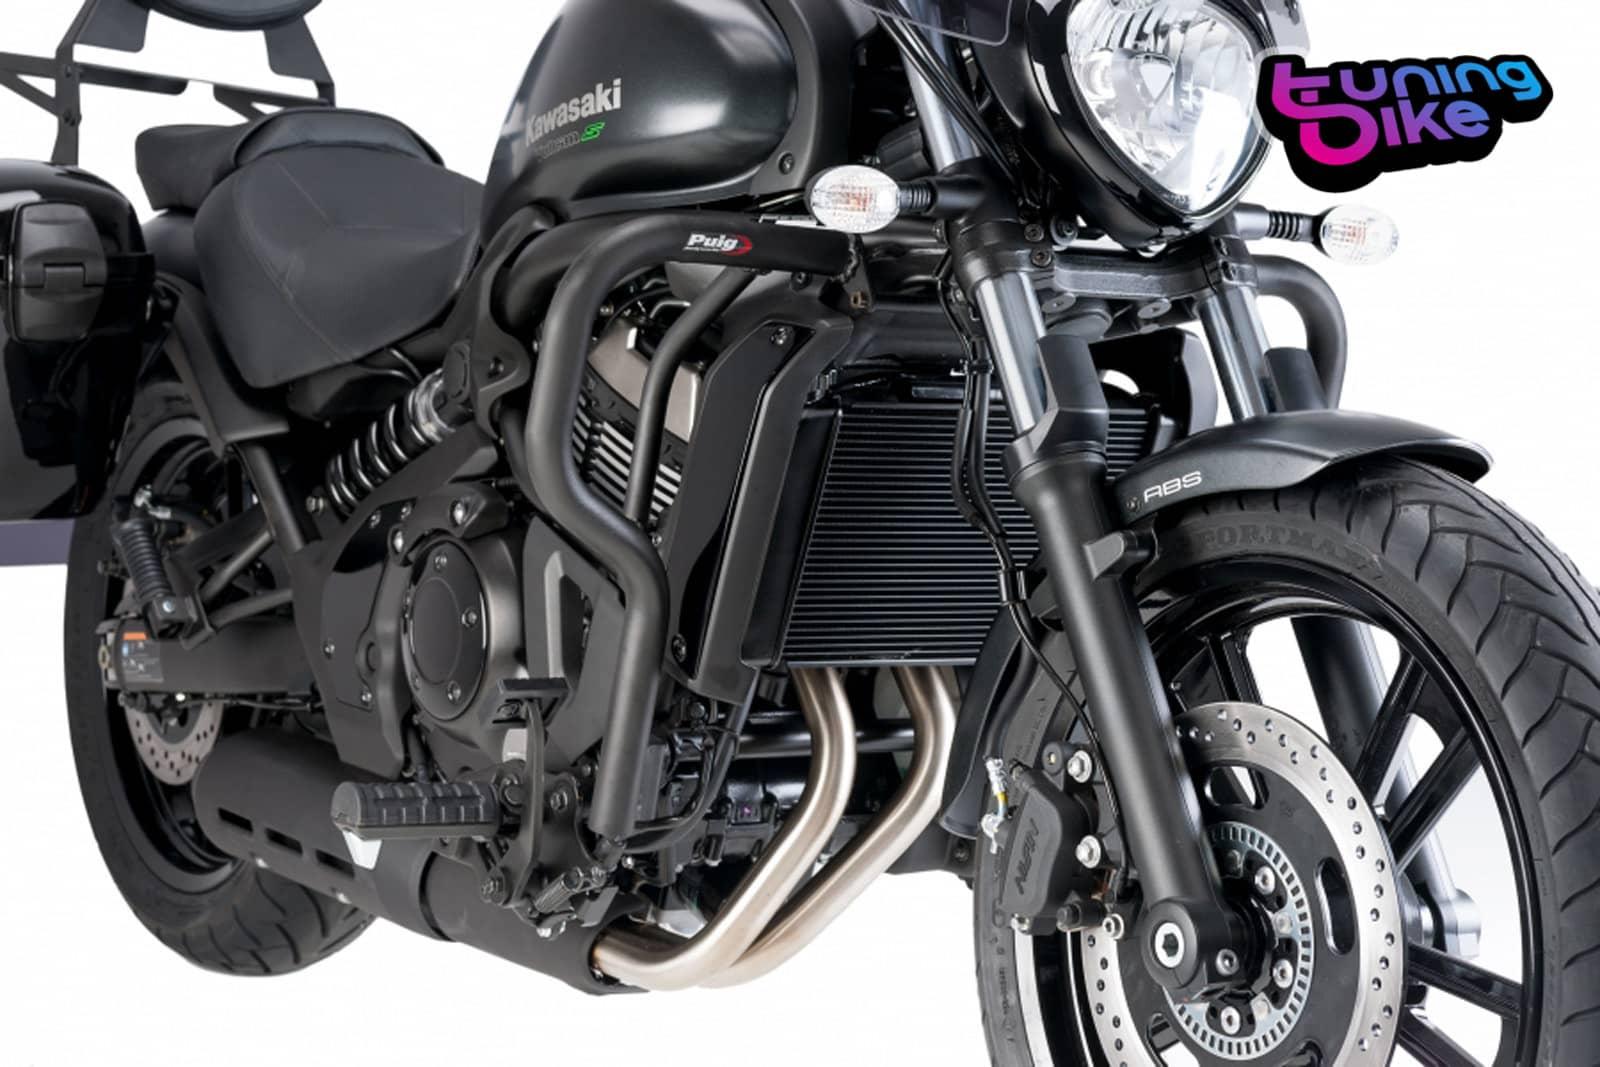 Details About Puig Engine Guards Kawasaki Vulcan S Cafe 17 18 Black